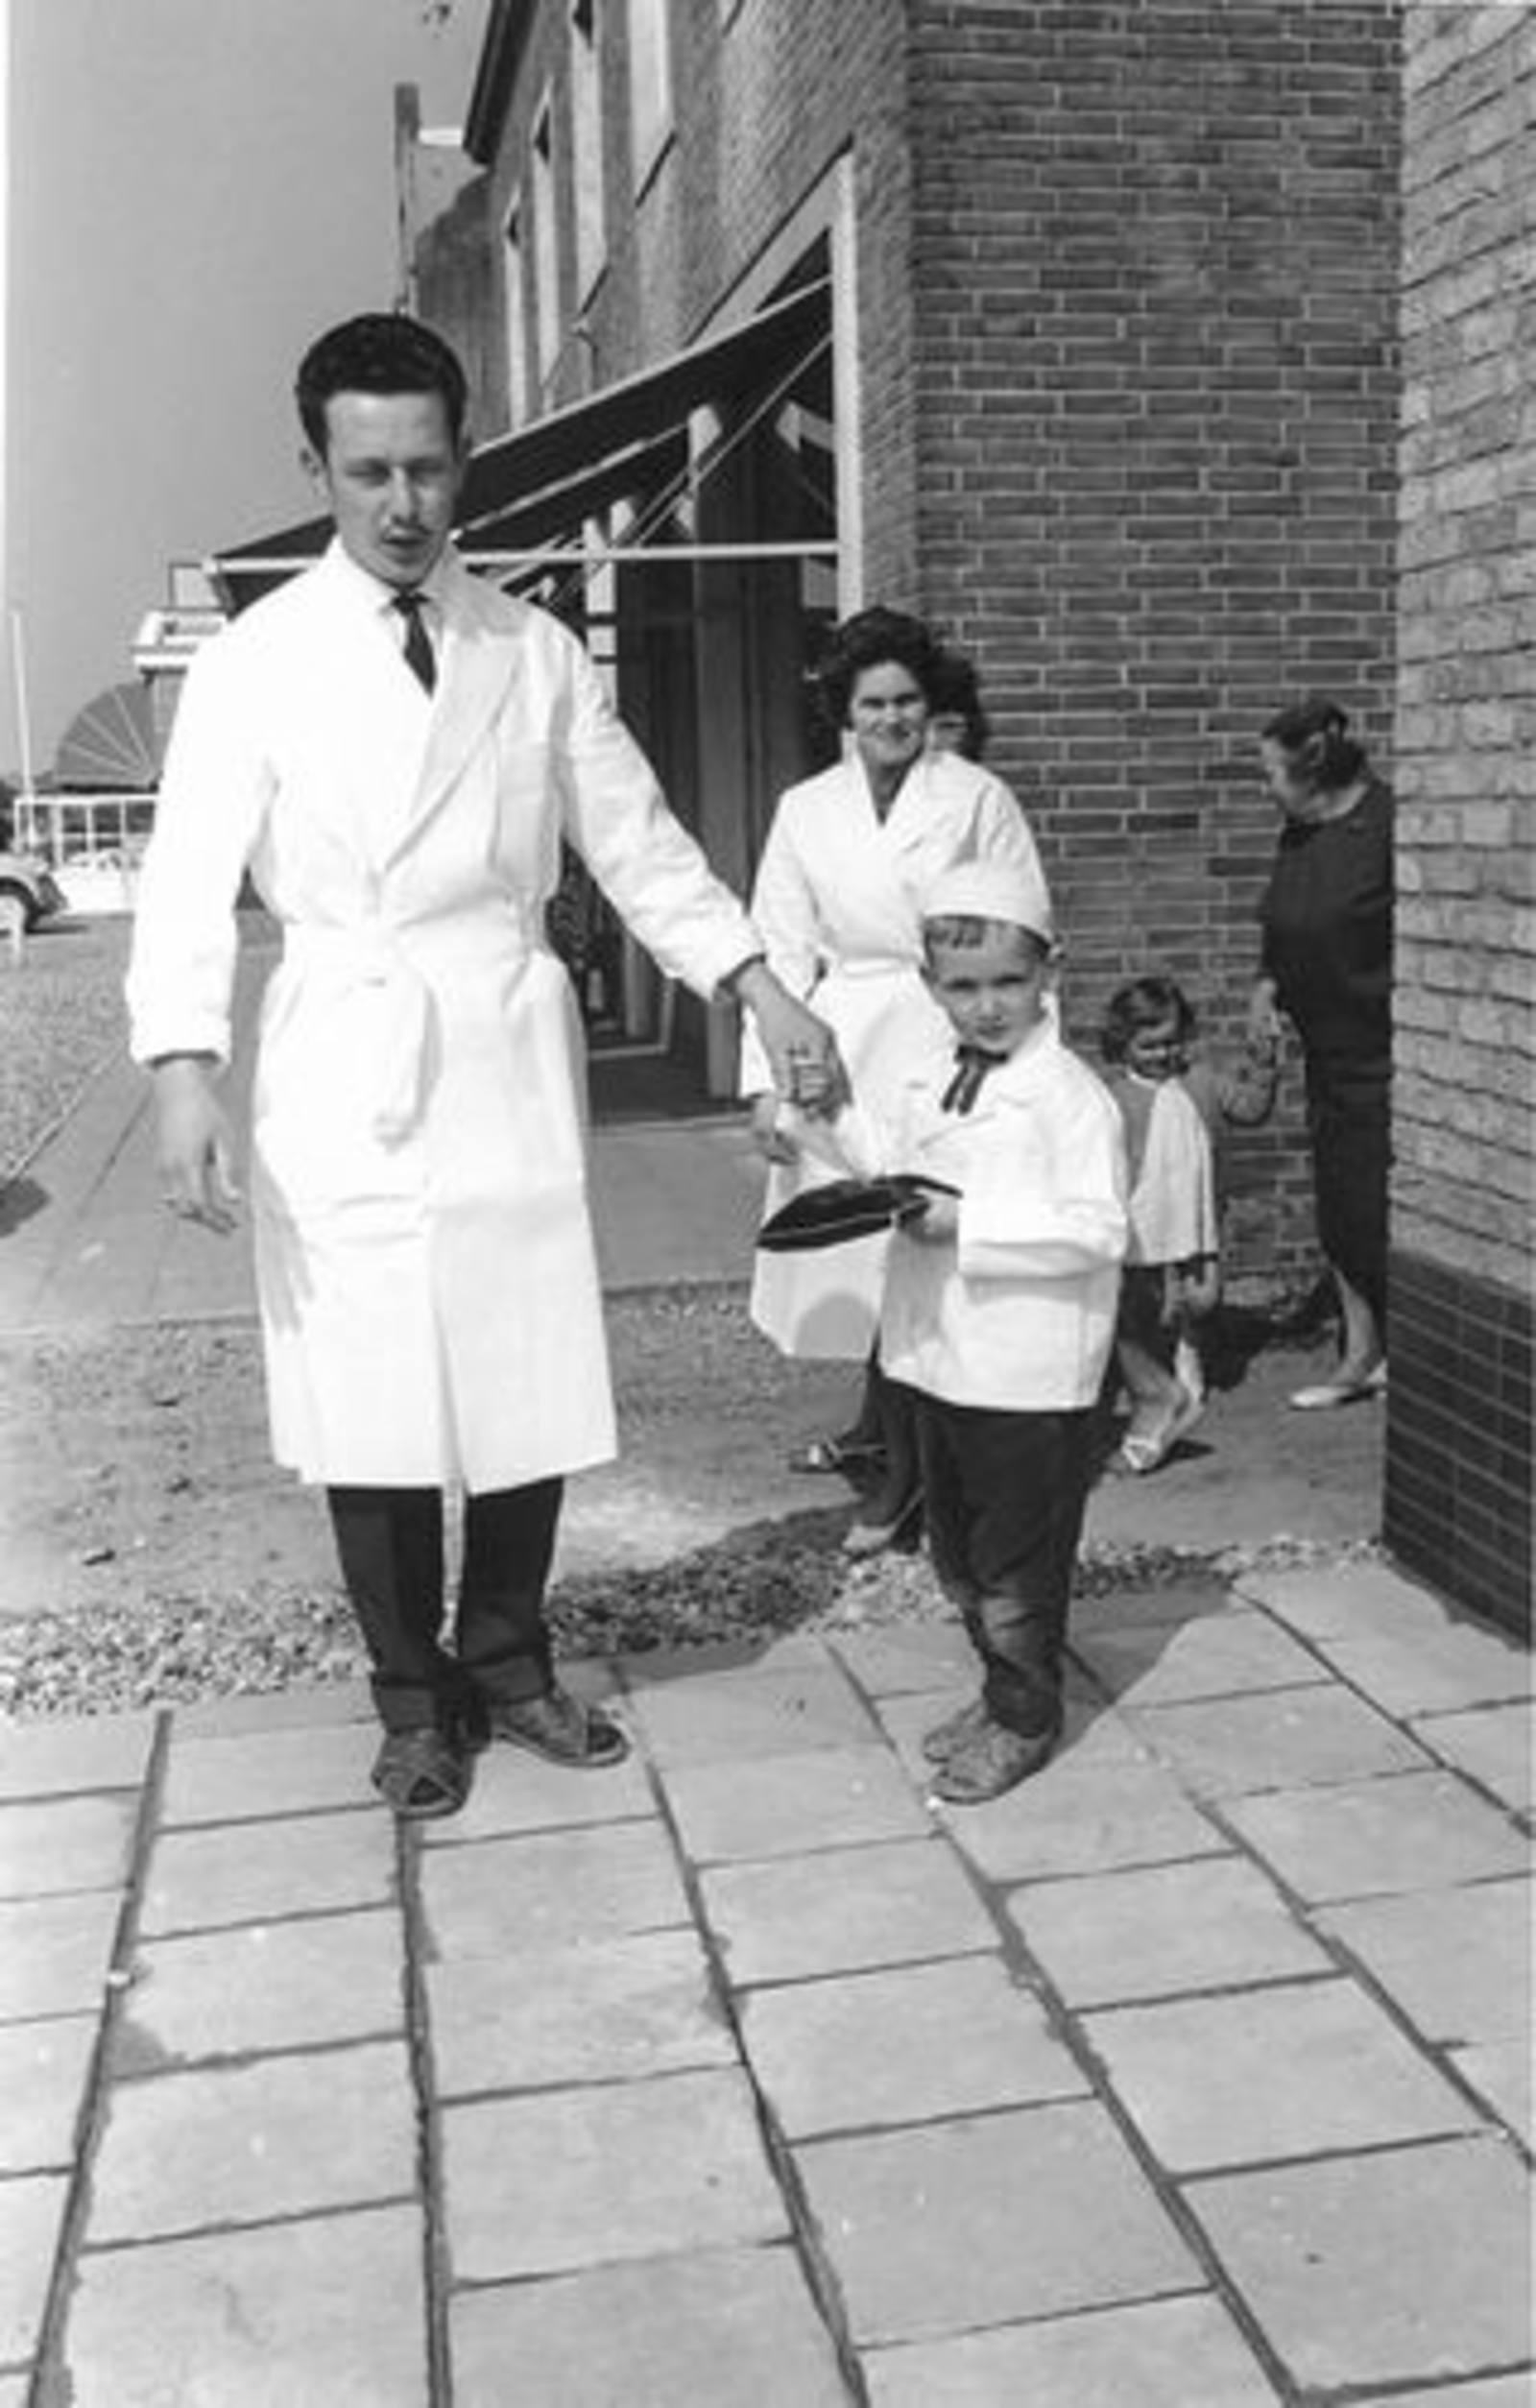 Hoofdweg O 0716 1961± Slagerij Piet de Koning Heropening 00